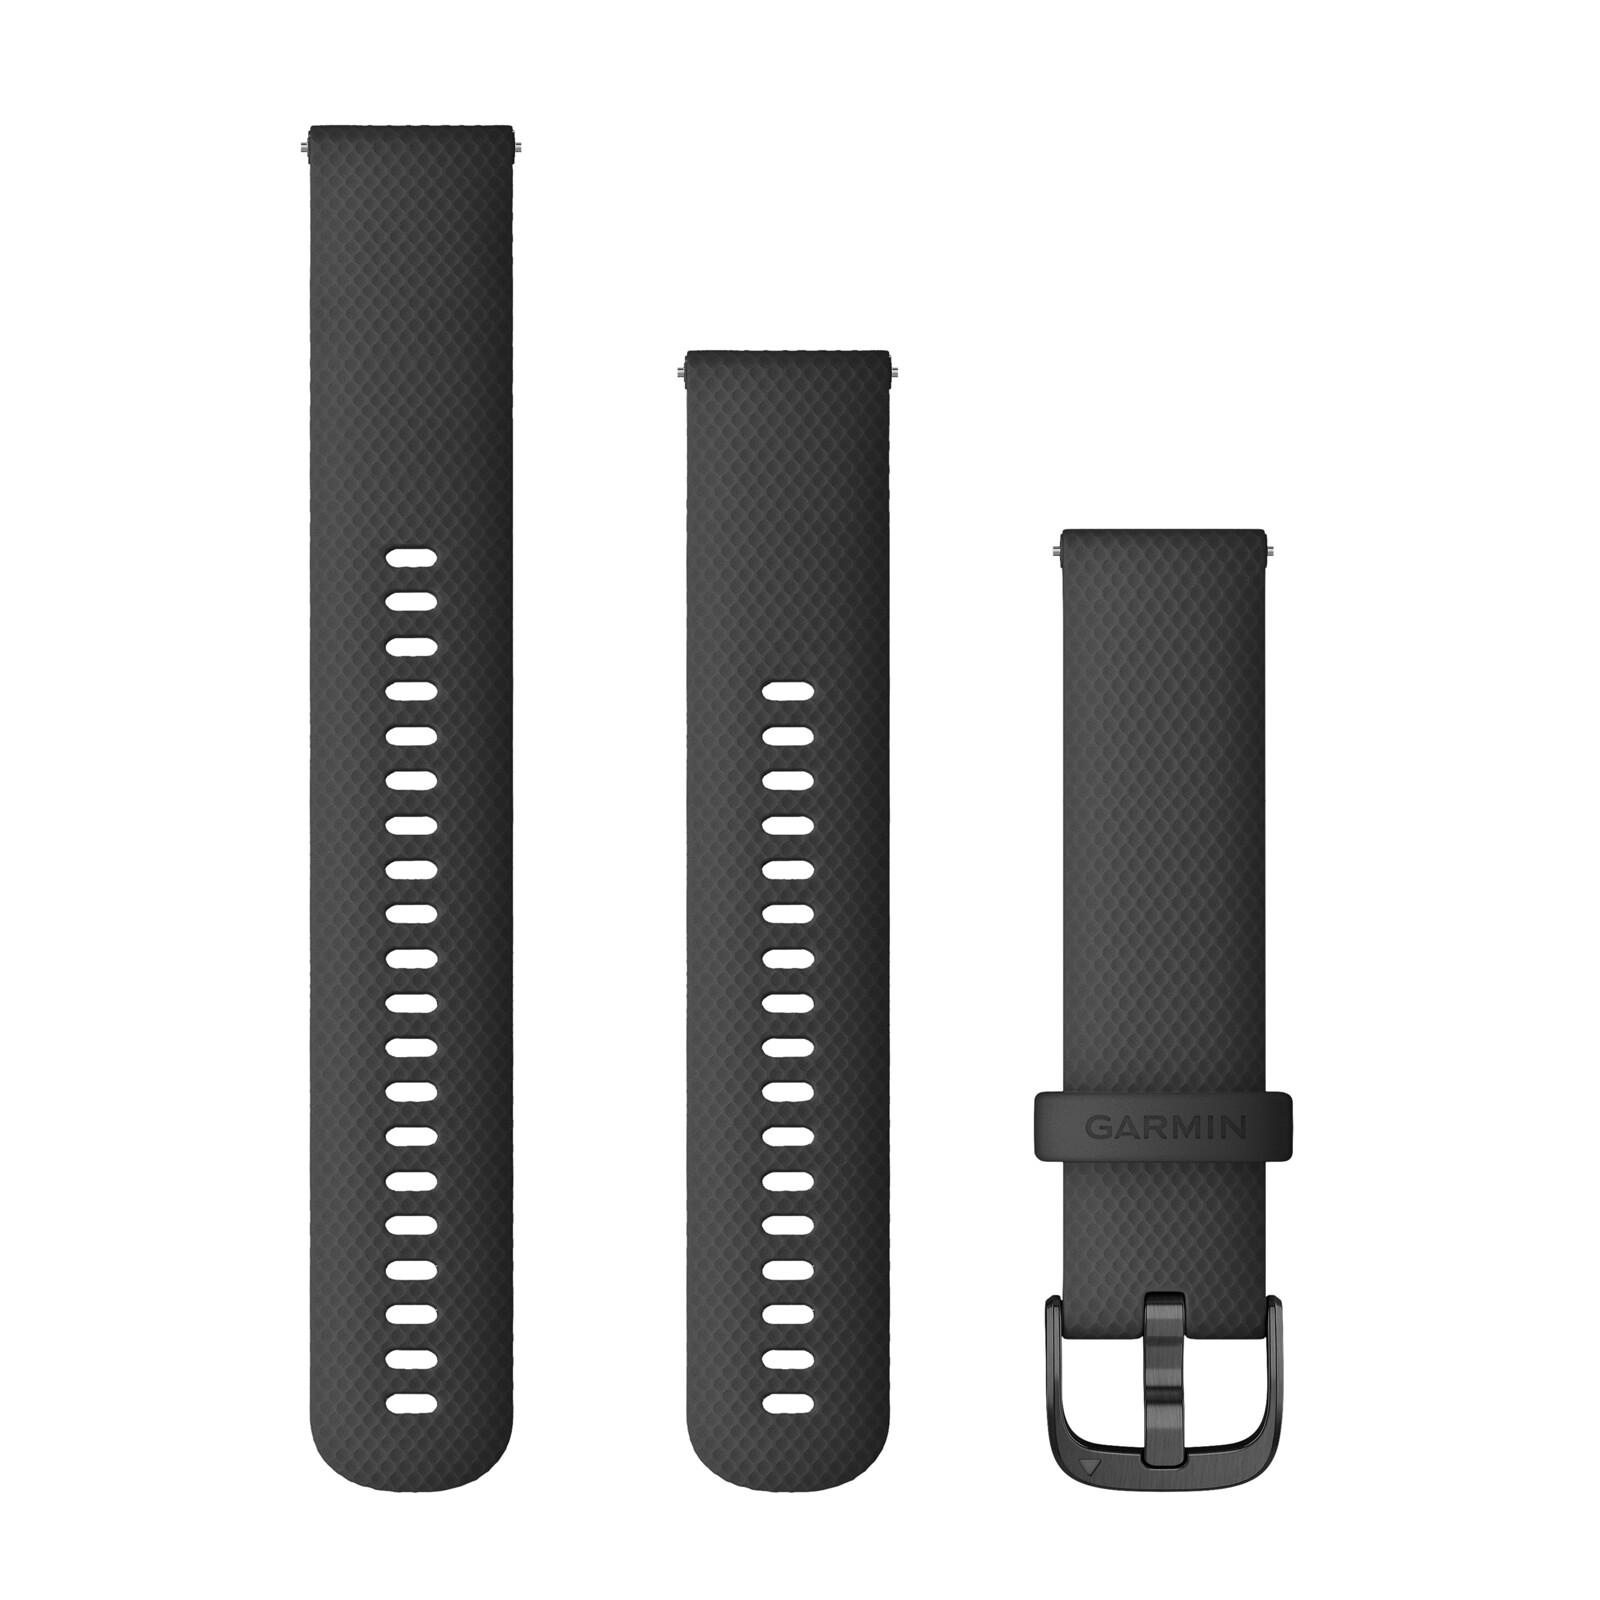 Garmin Uhrenarmband Vivoactive 20mm Silikon schwarz